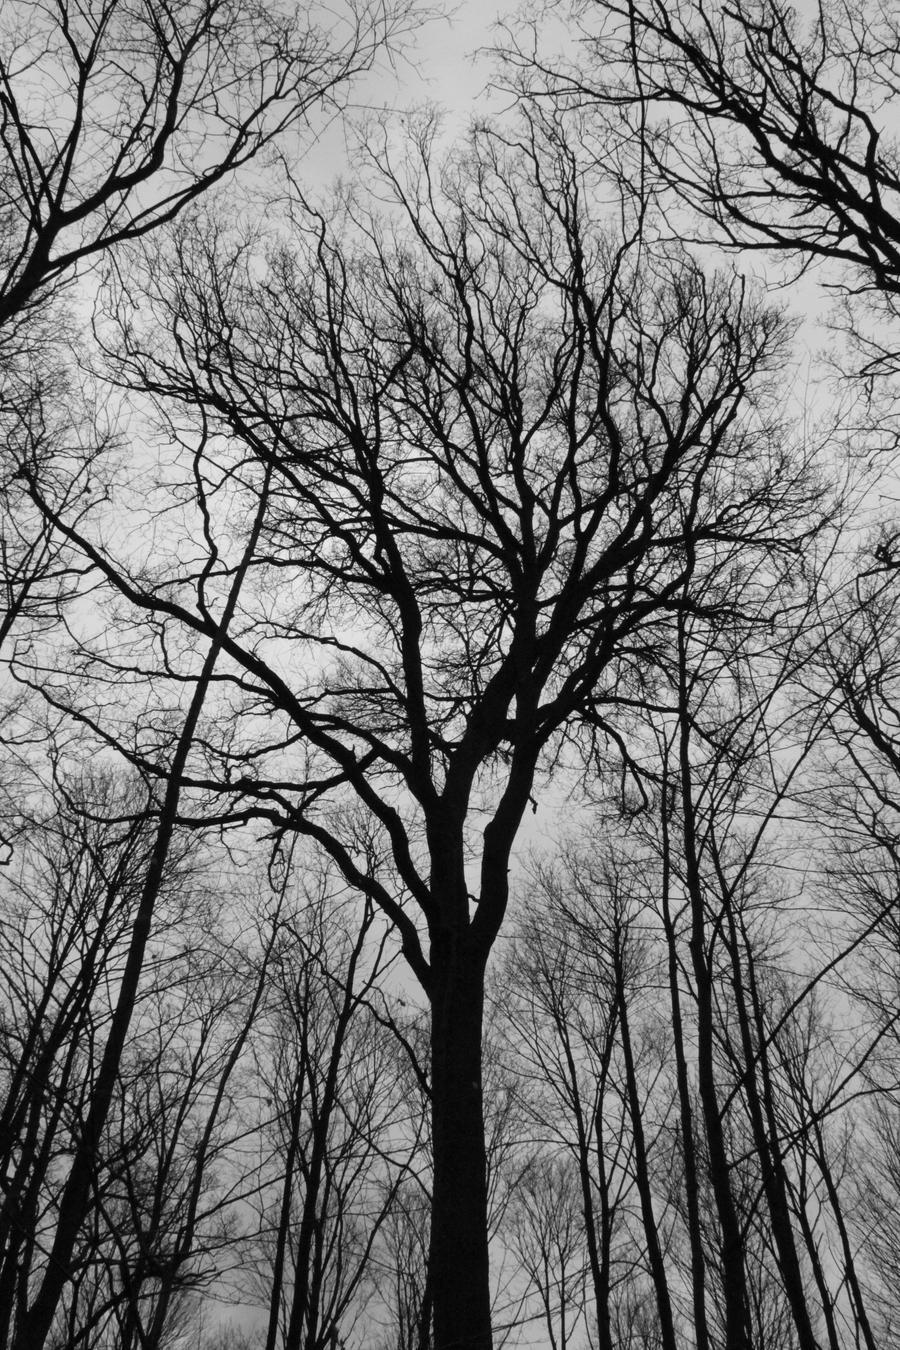 Dark Tree by Canojo-Rebel on DeviantArt